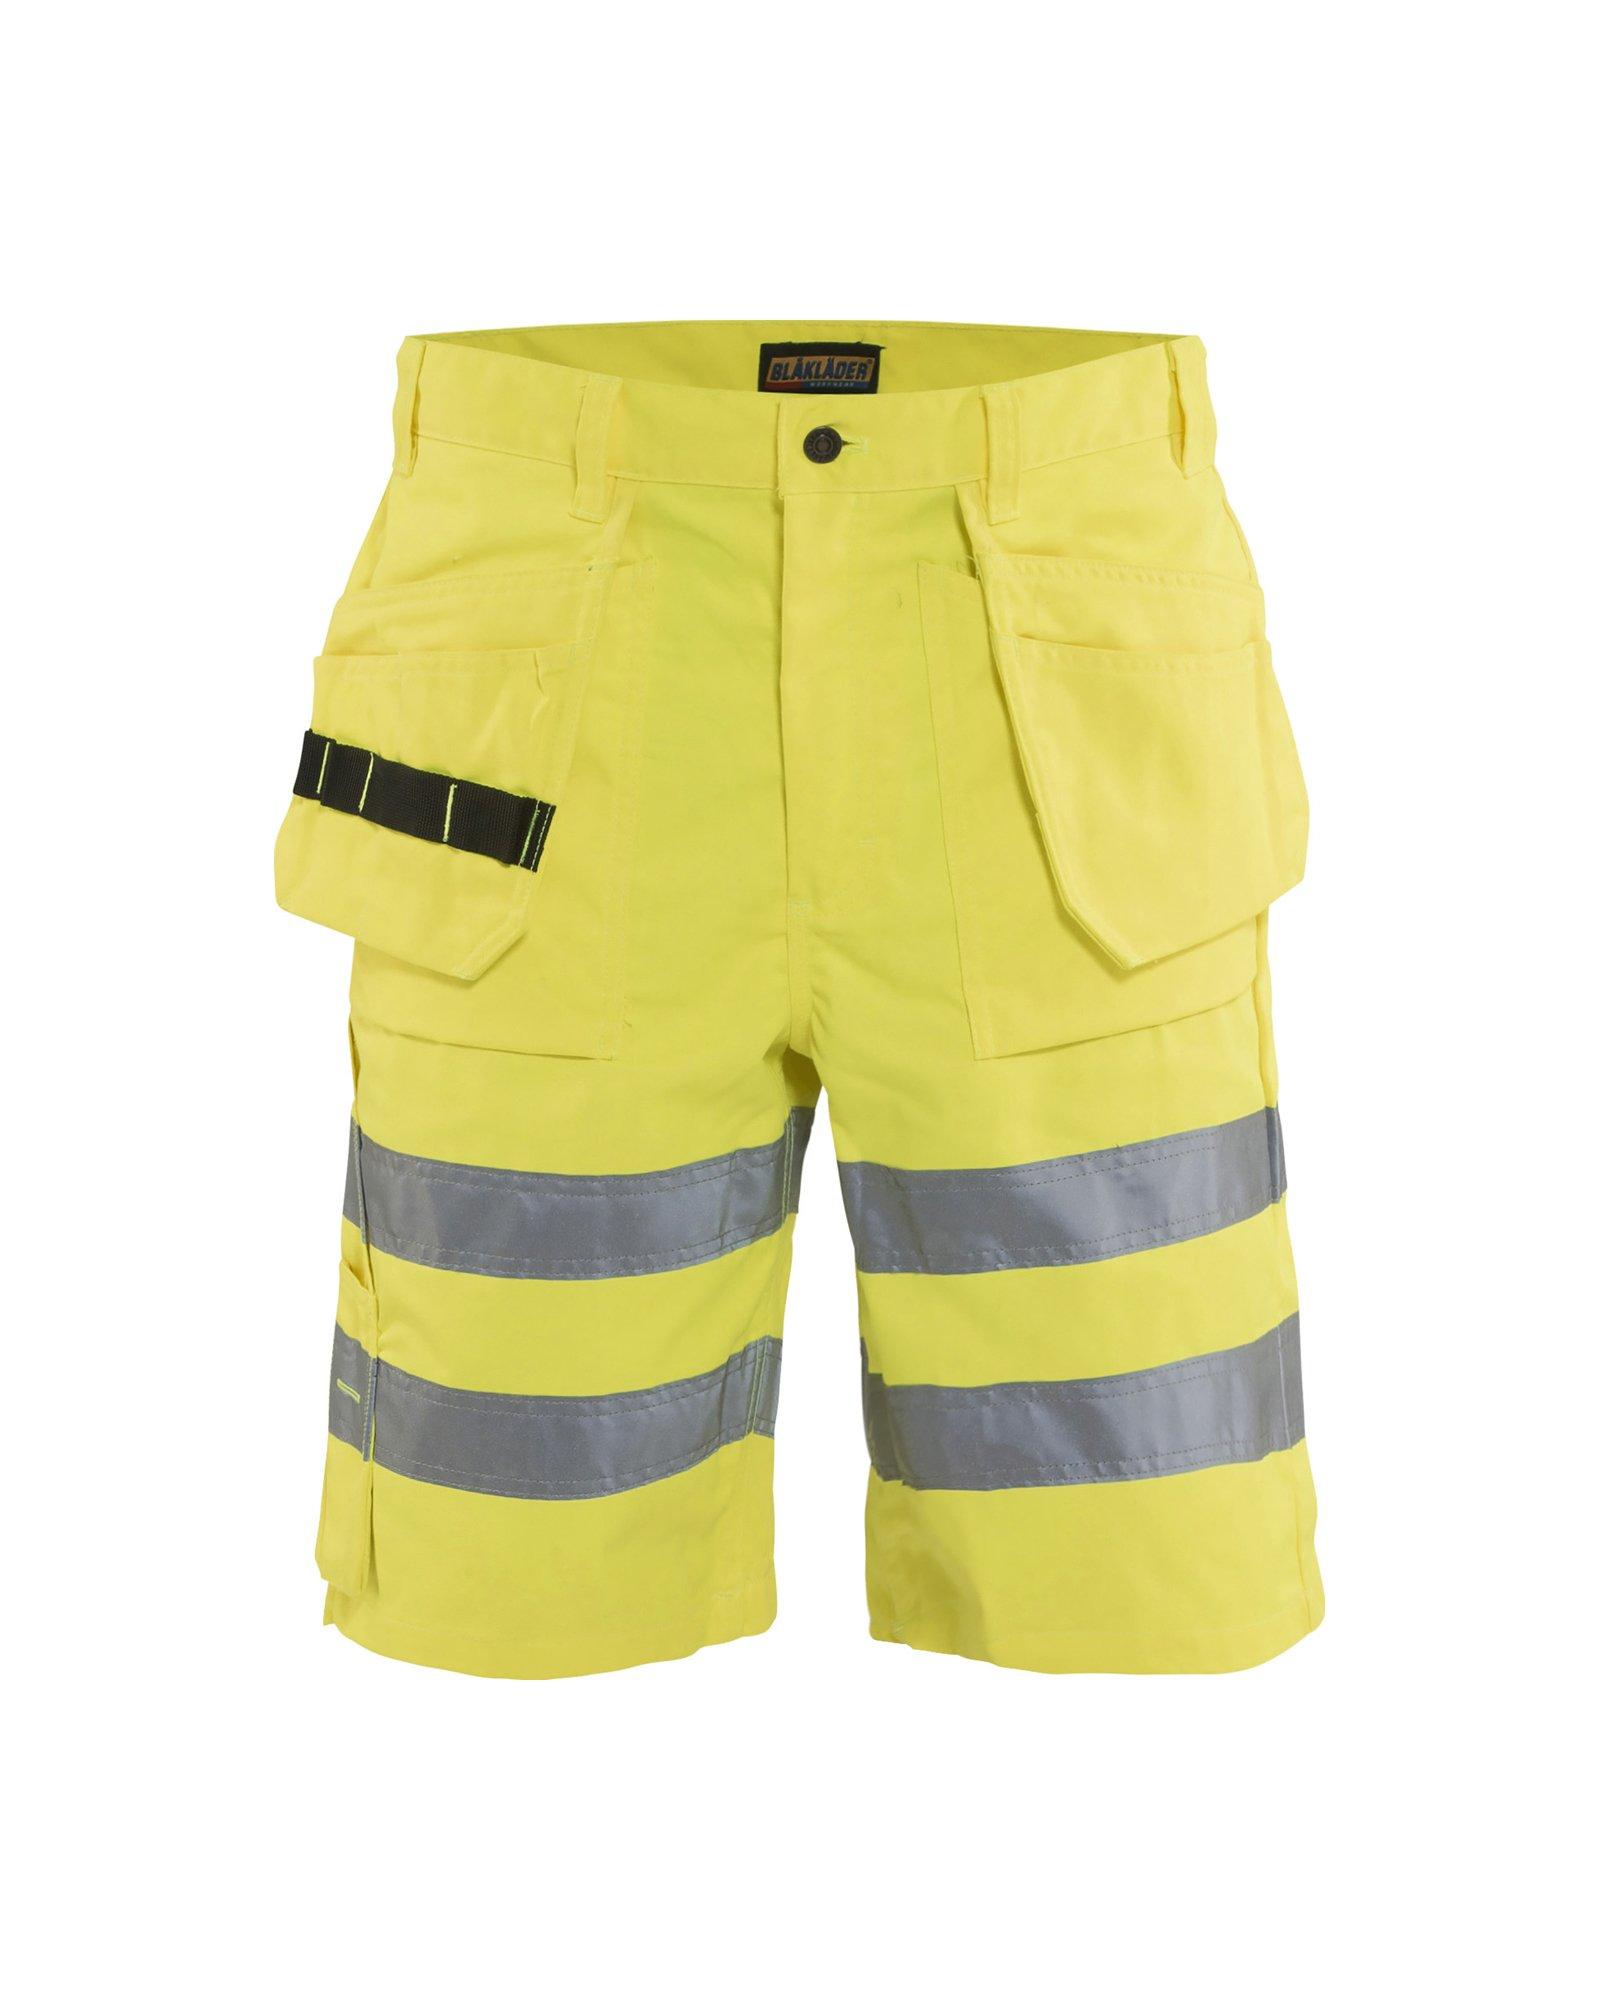 Clothes Made for Manual Labor: Construction, Carpentry, Etc. Workwear Bundle: Blaklader Hi-Vis Shorts Yellow 34 & Hammer Hook